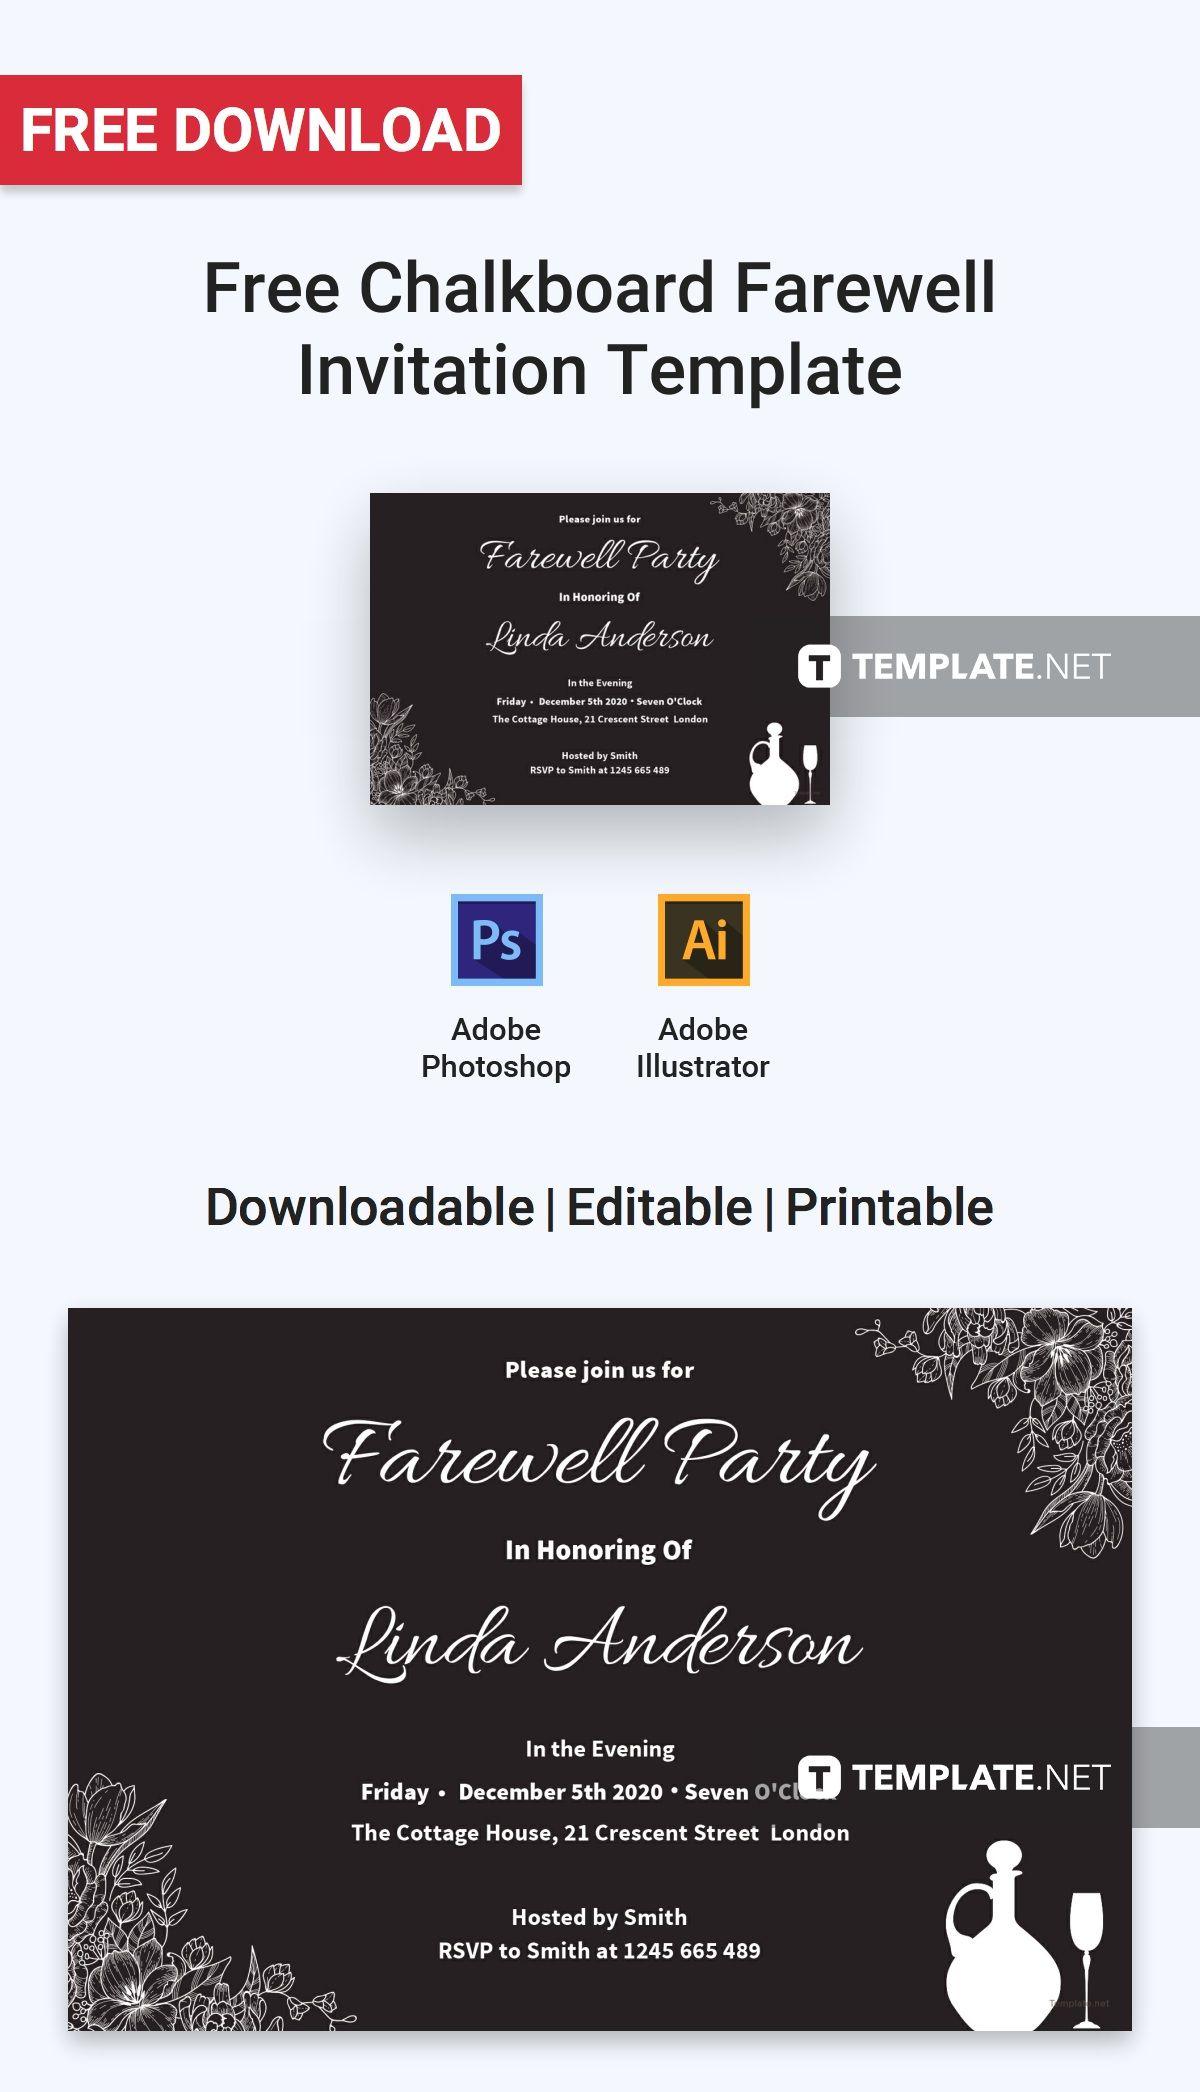 Chalkboard Farewell Invitation Template Free Jpg Illustrator Word Apple Pages Psd Publisher Template Net Farewell Invitation Invitation Template Farewell Invitation Card